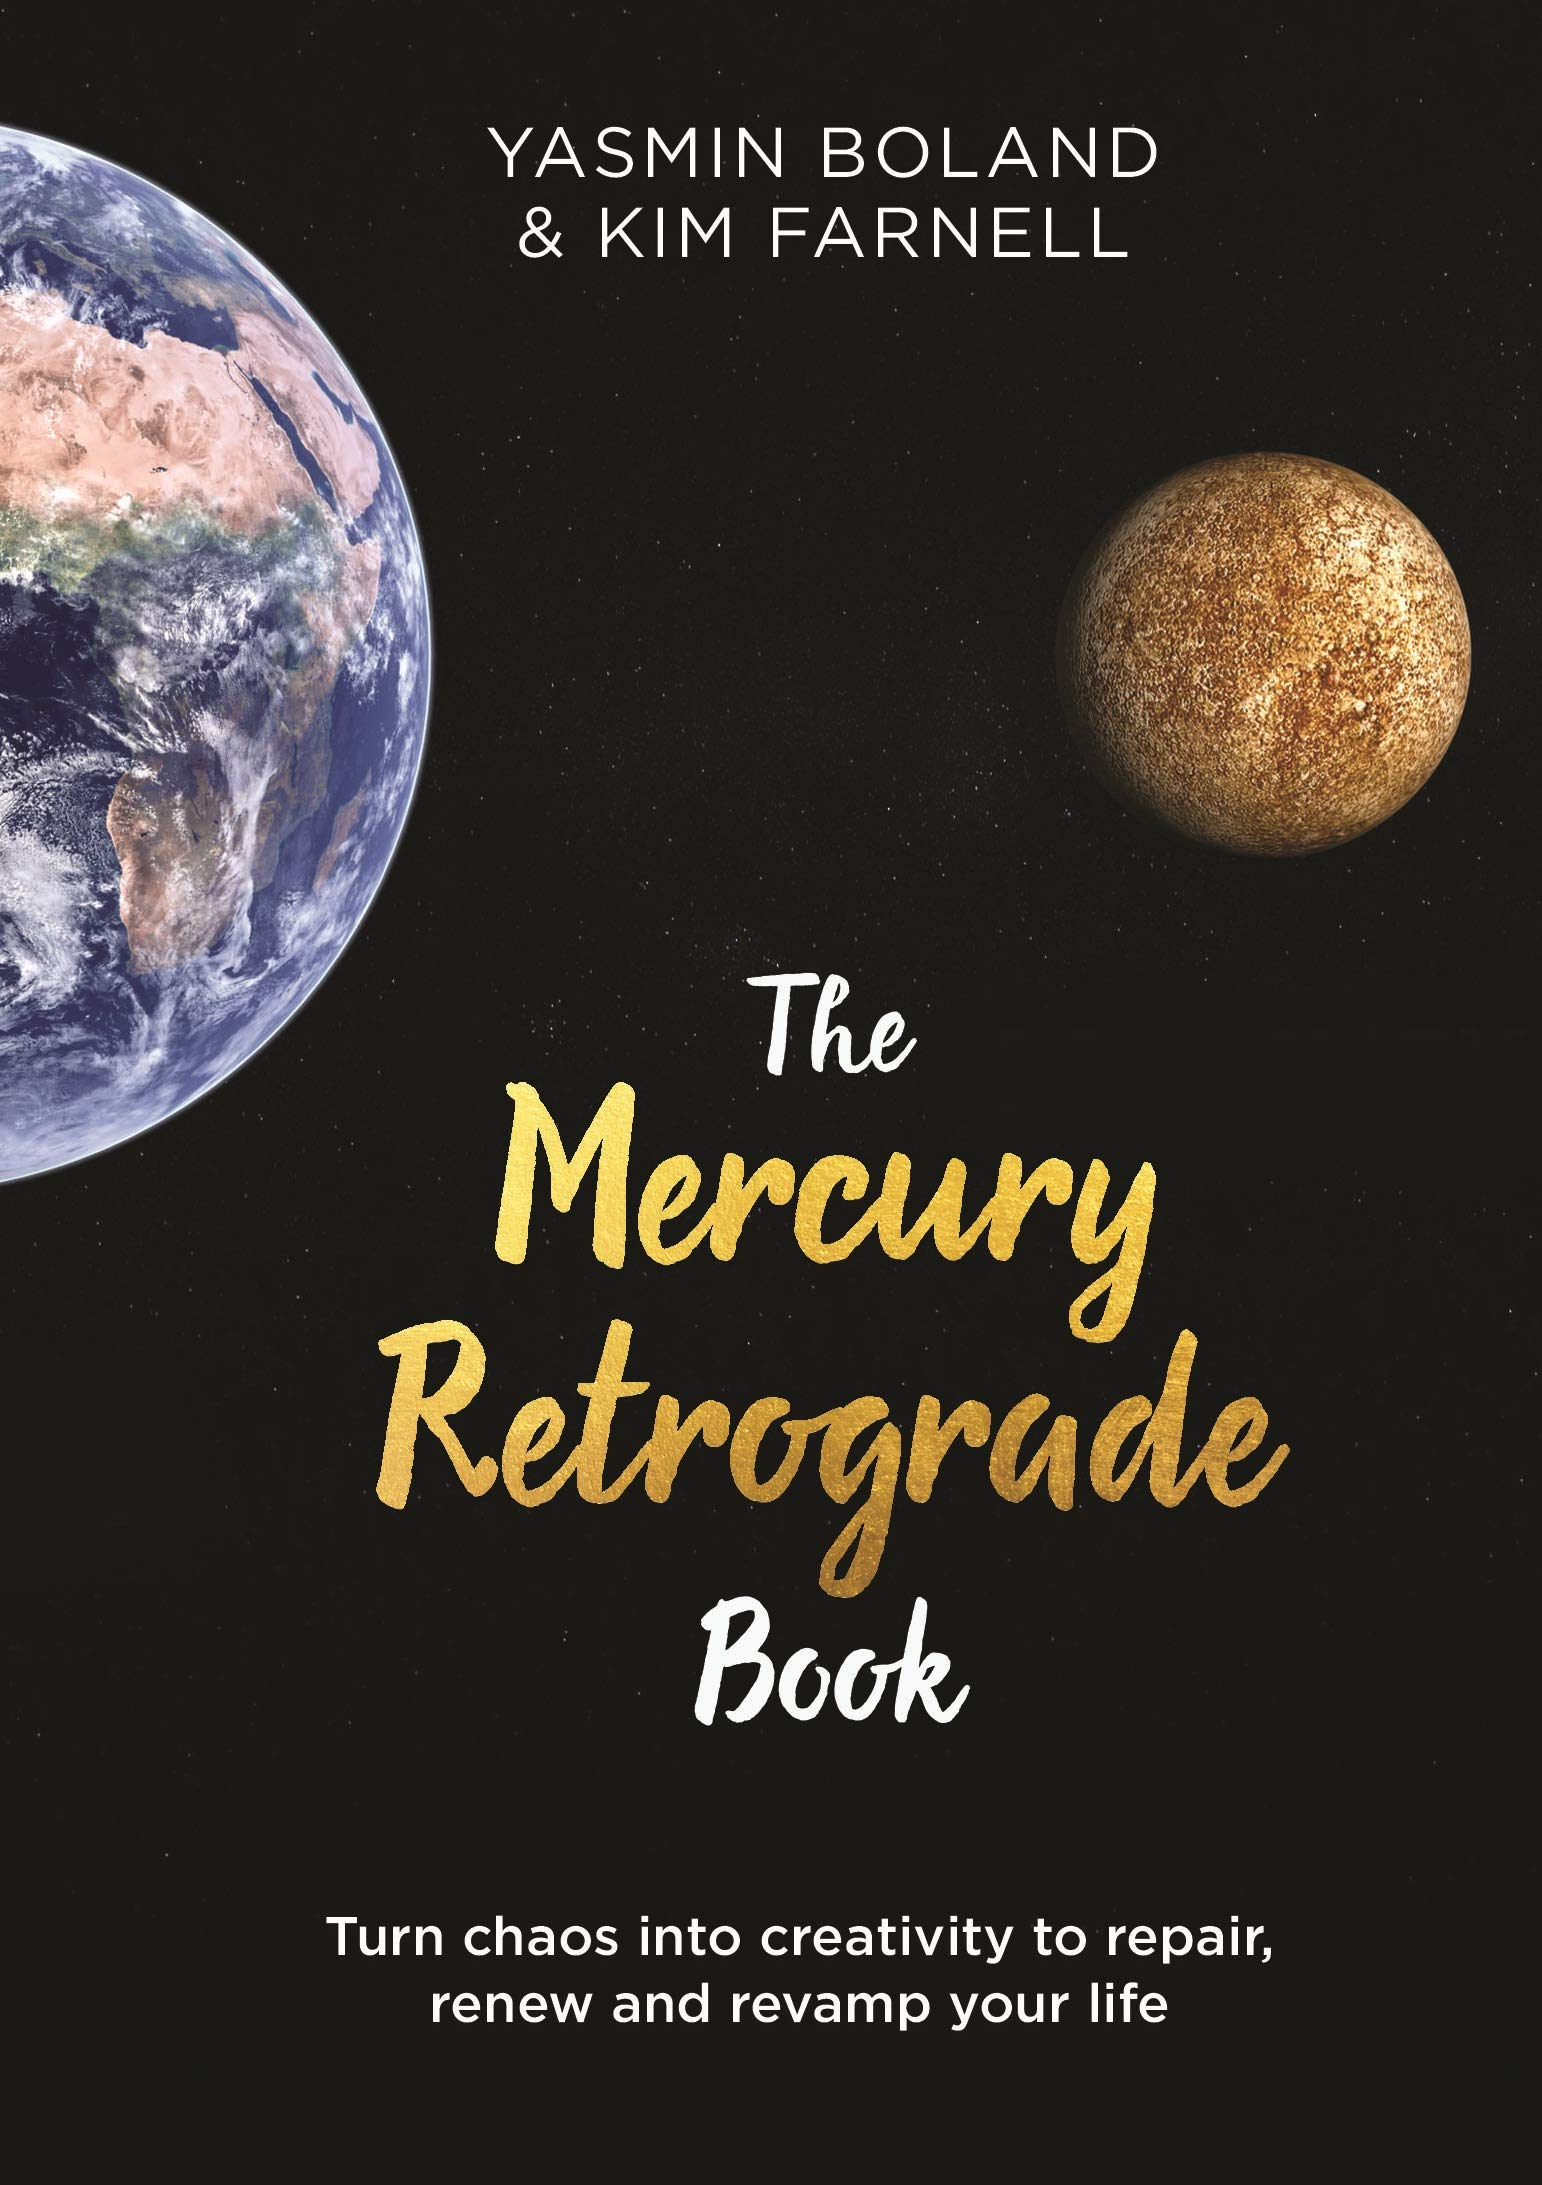 The Mercury Retrograde Book: Turn Chaos into Creativity to